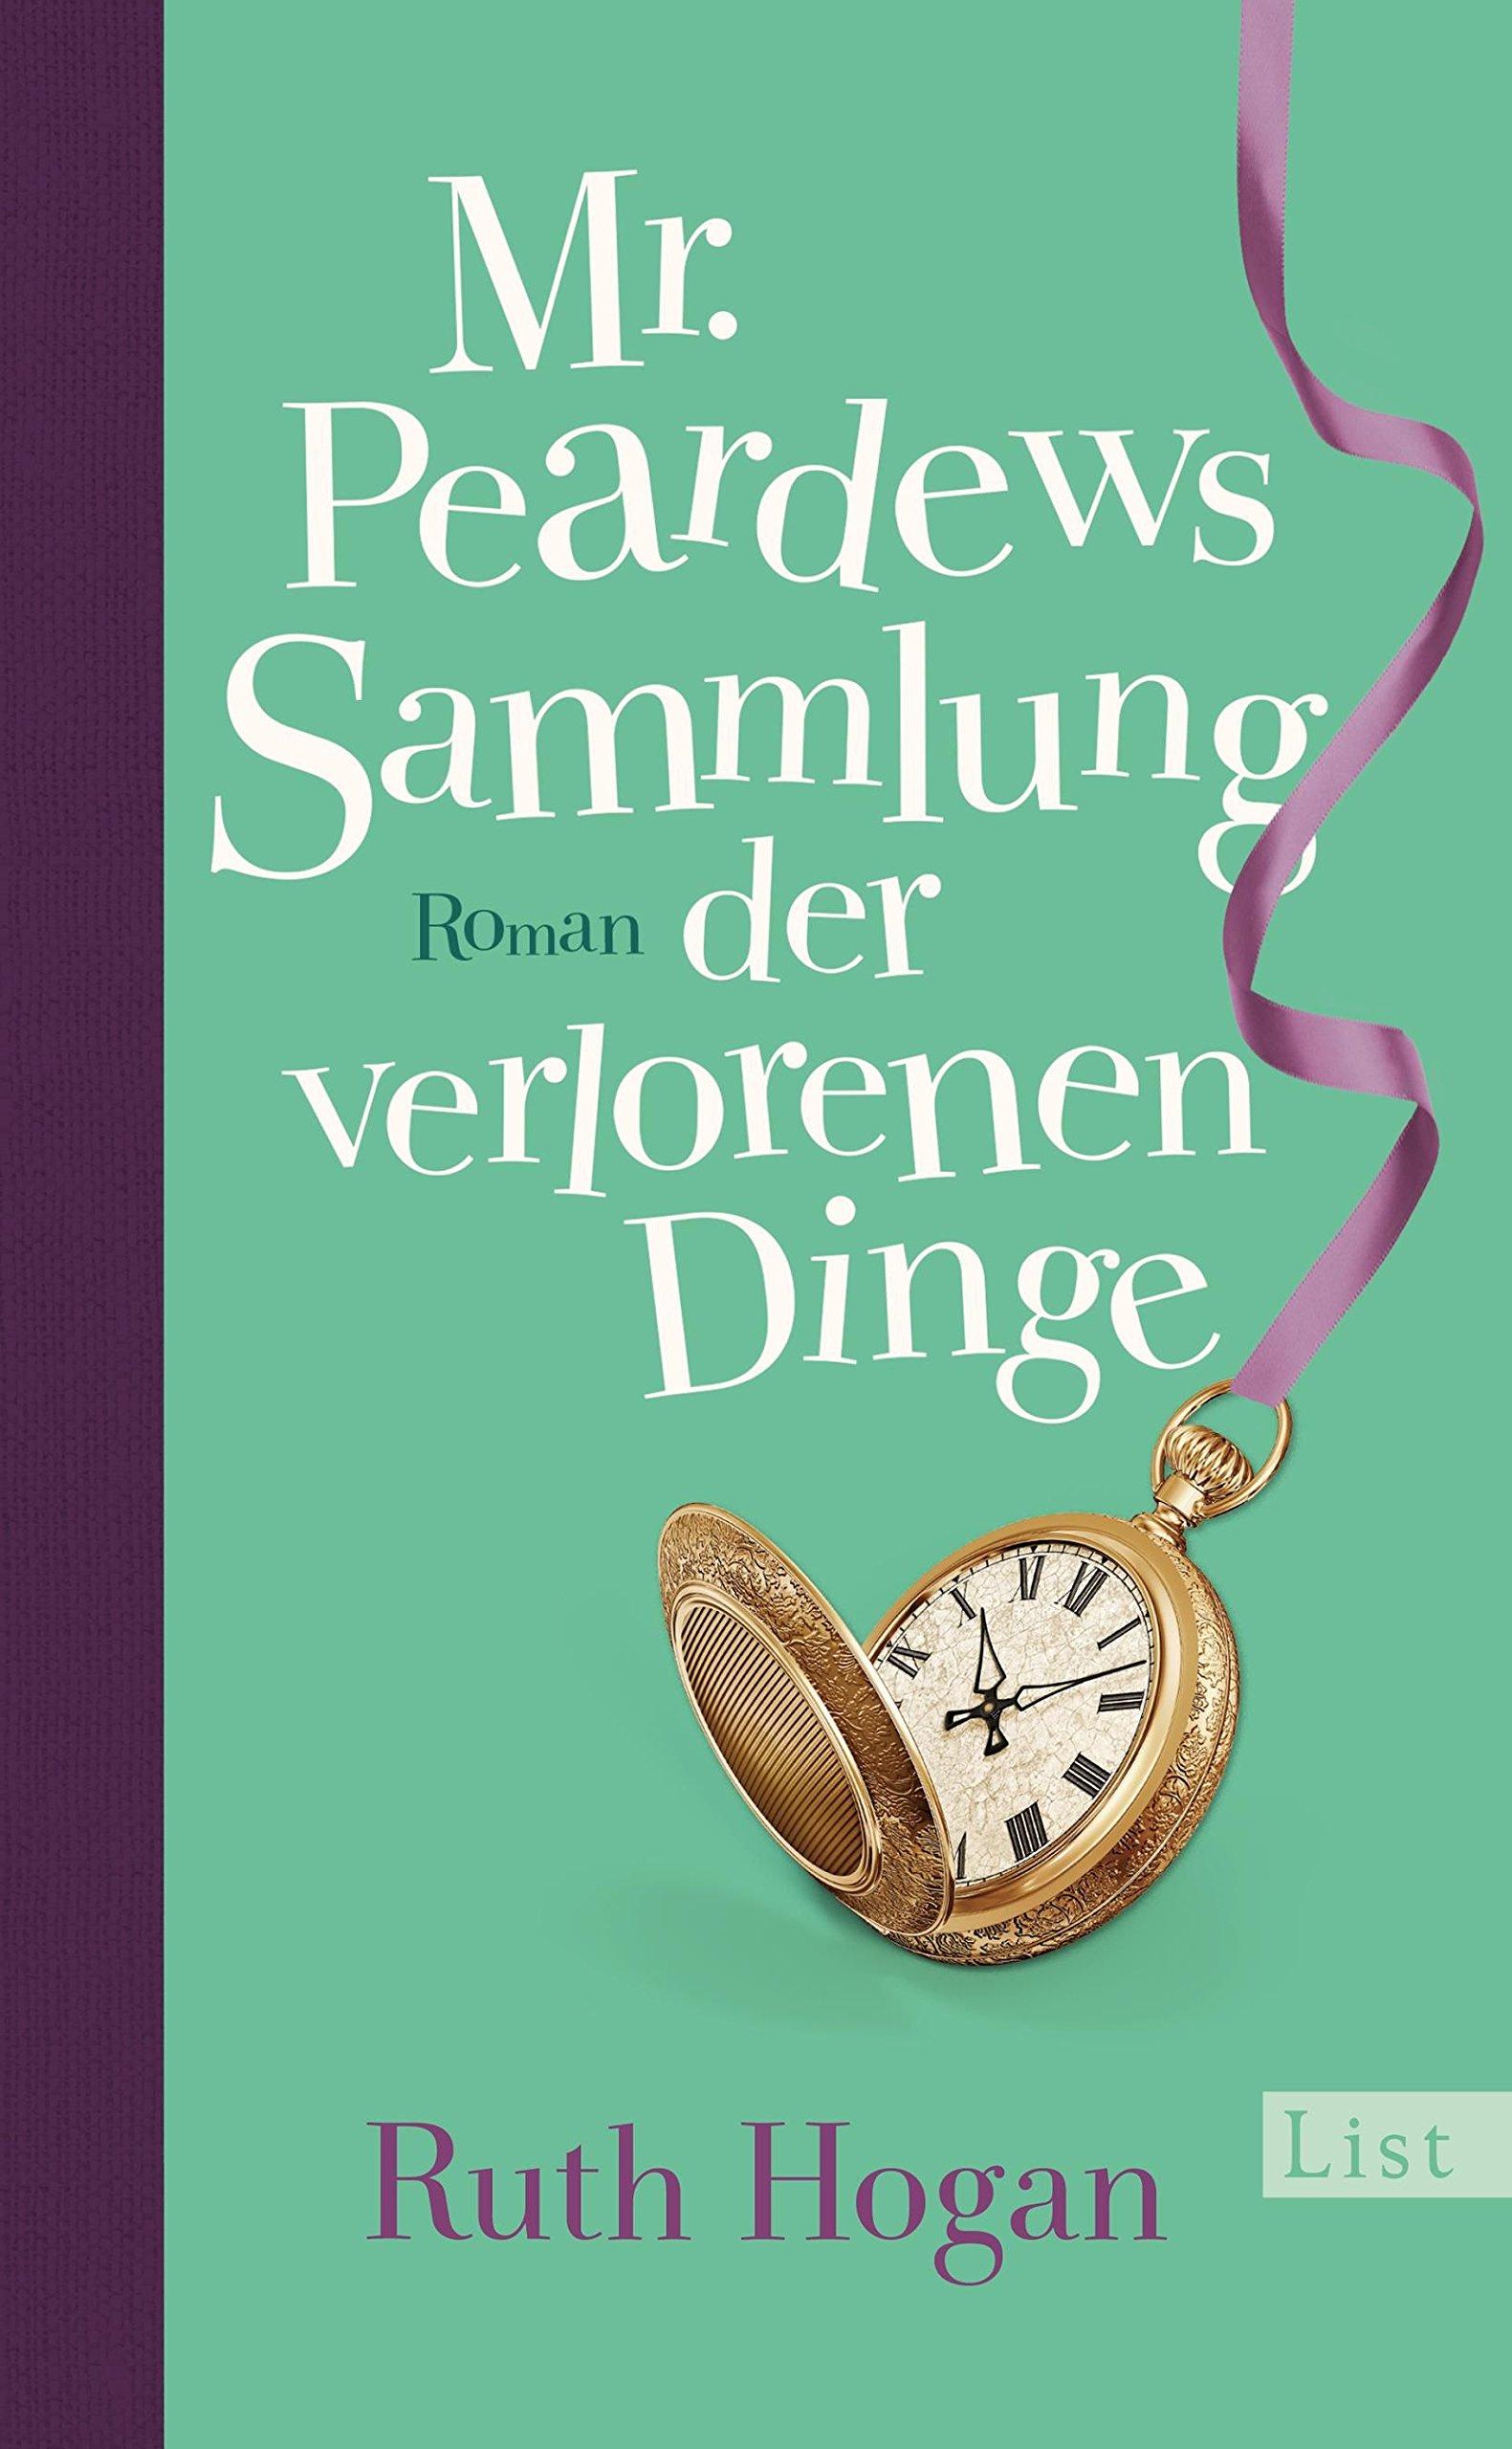 Mr. Peardews Sammlung der verlorenen Dinge: Roman: Amazon.de: Ruth ...